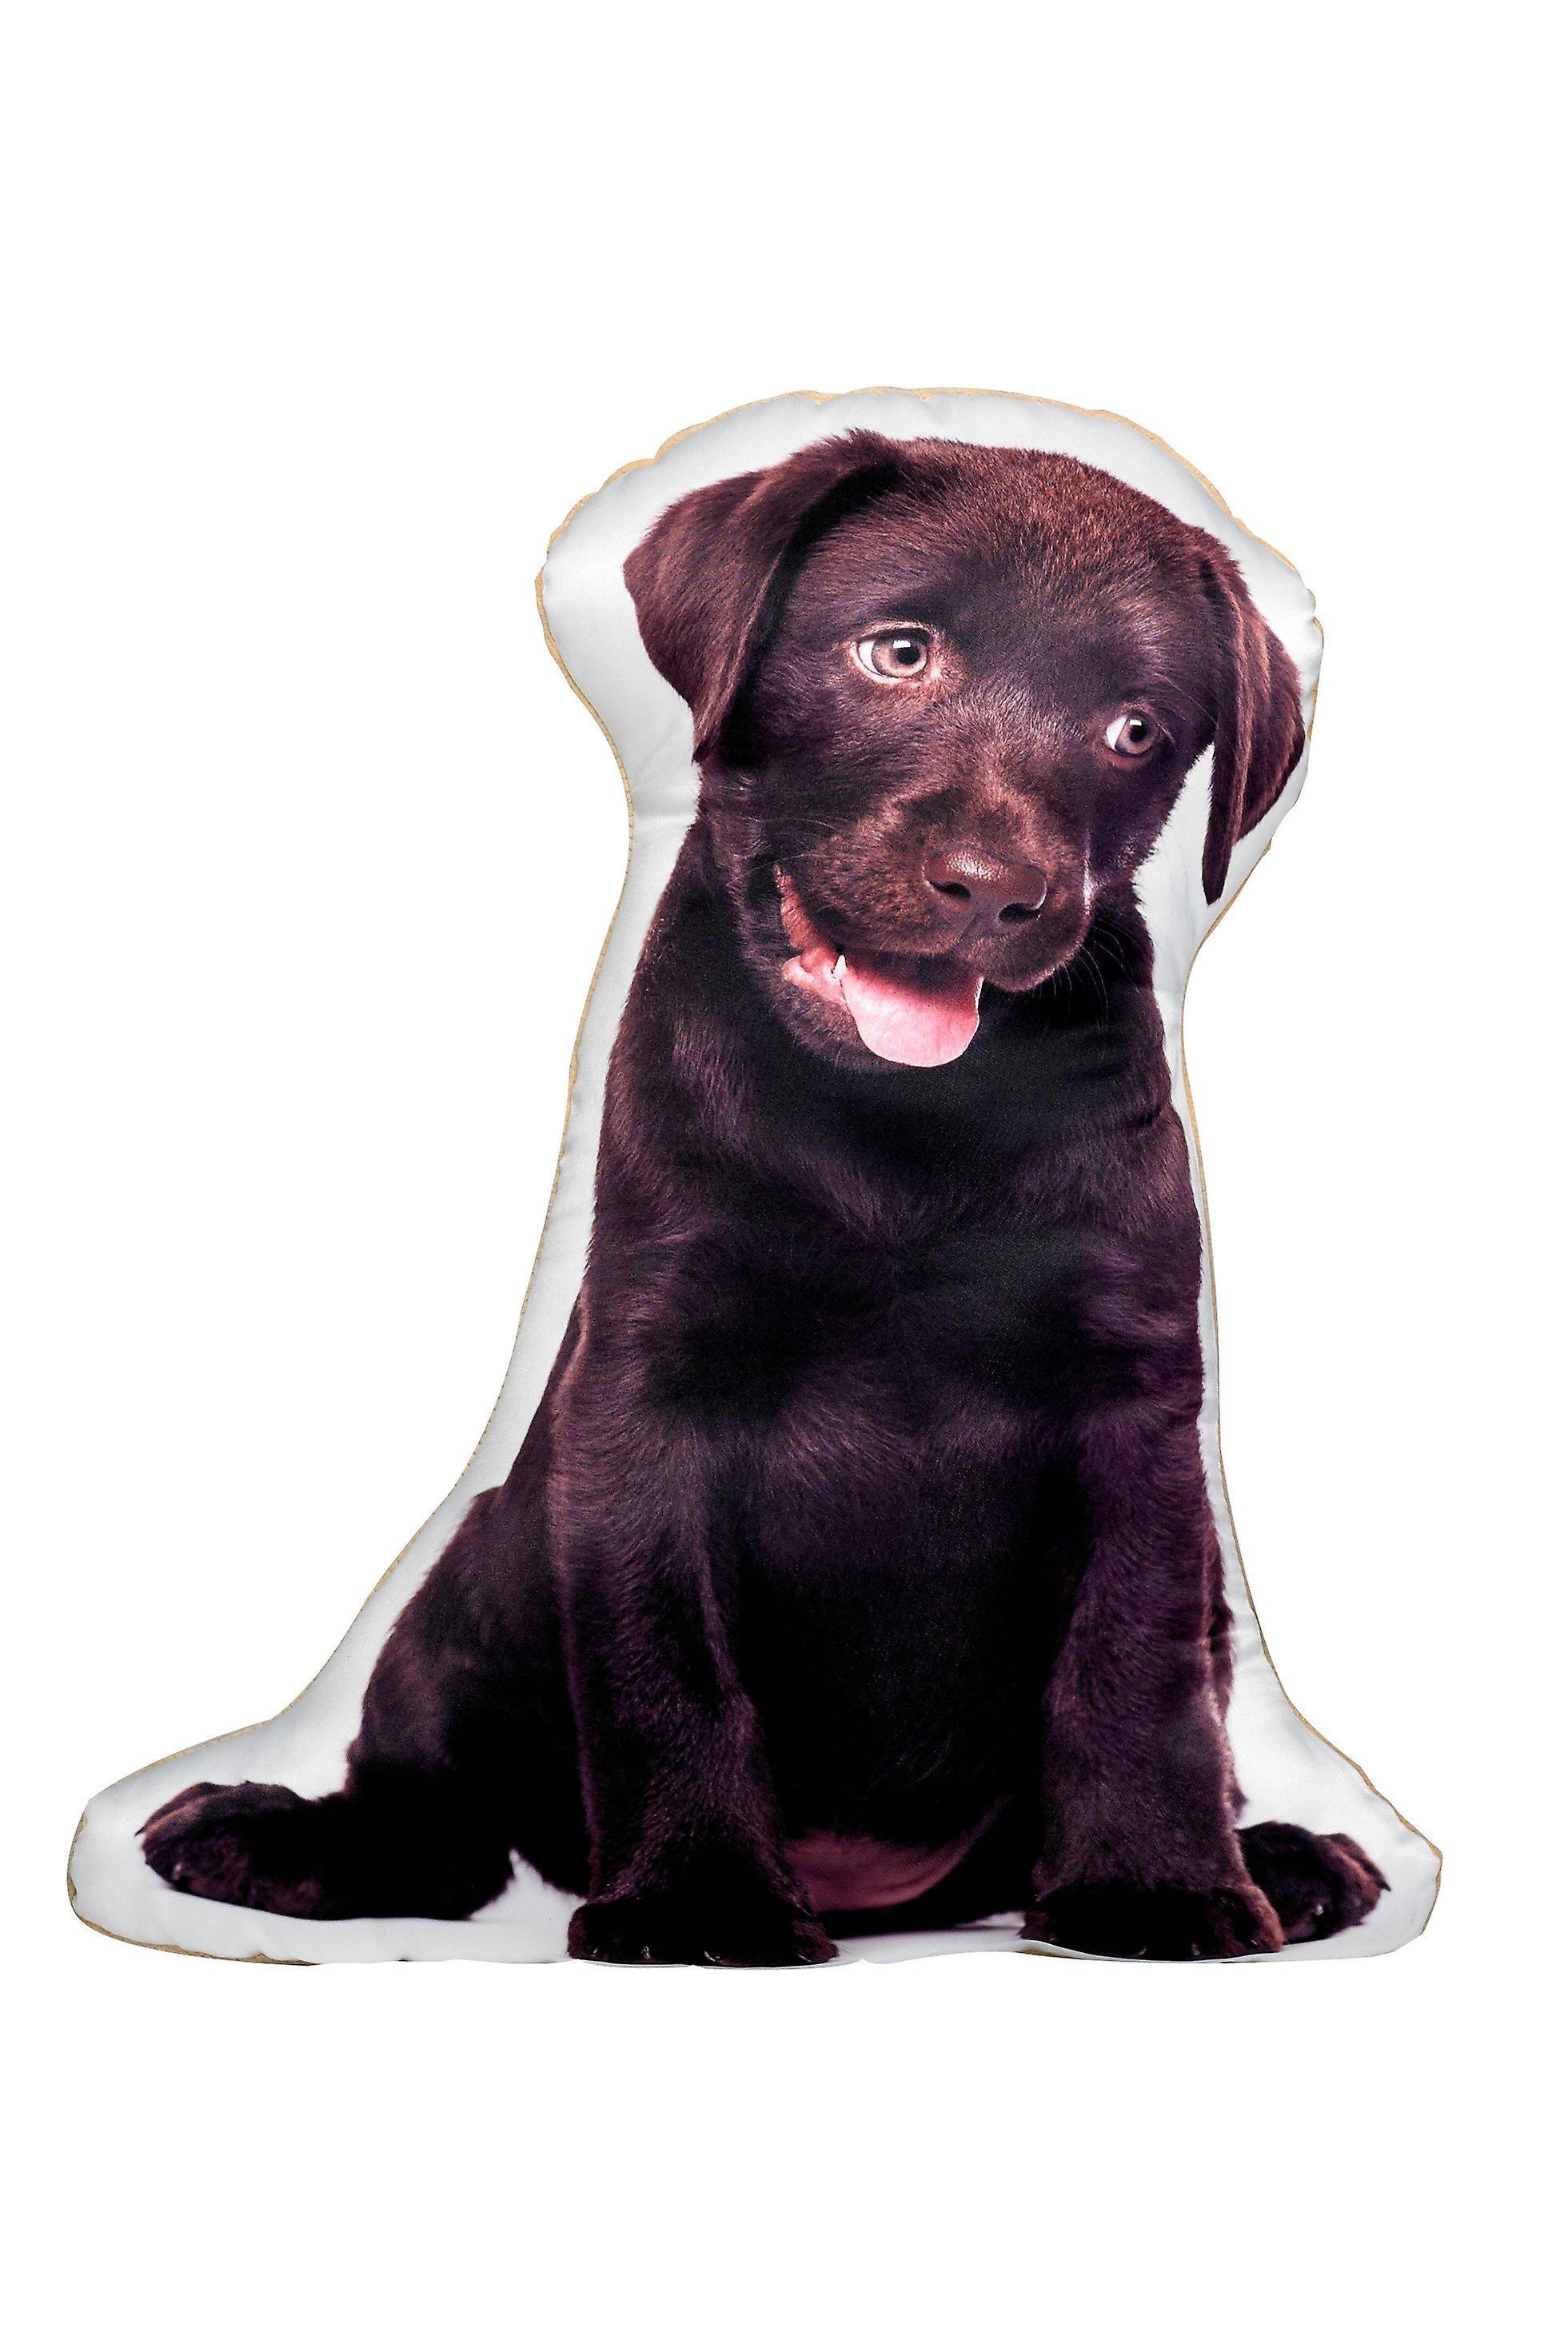 Adorable chocolate labrador shaped cushion